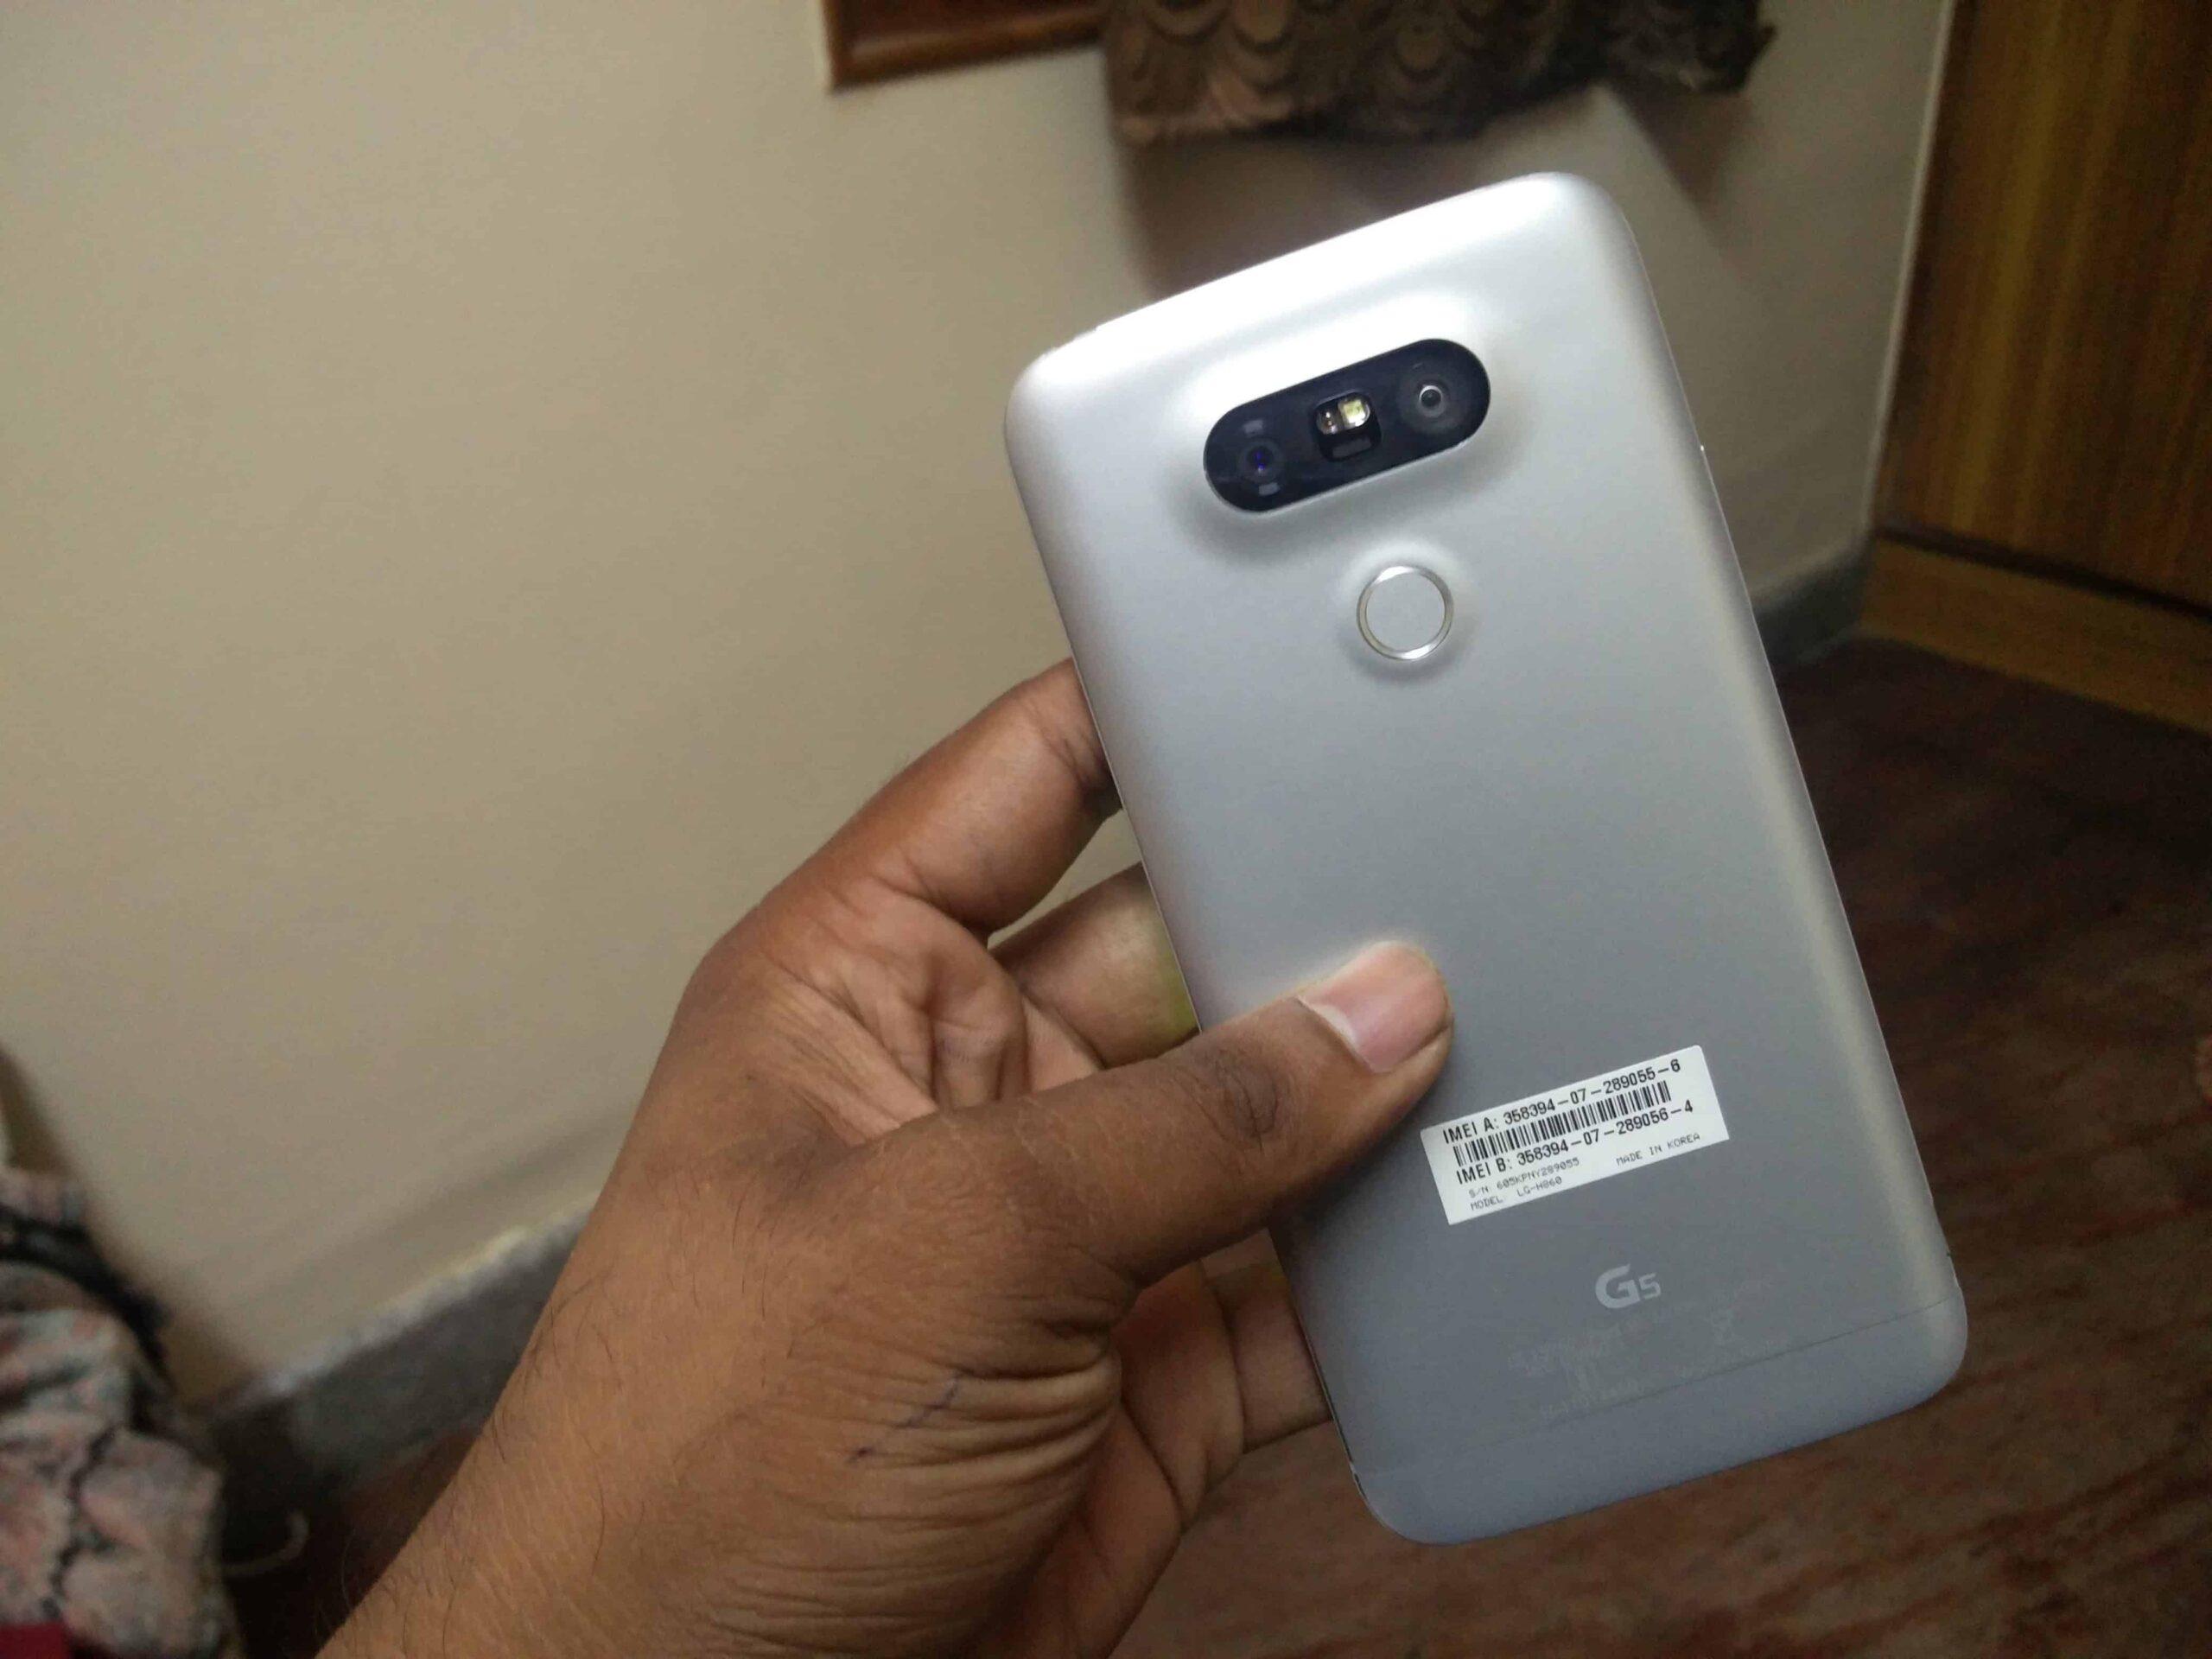 LG G5 Backside Appearance